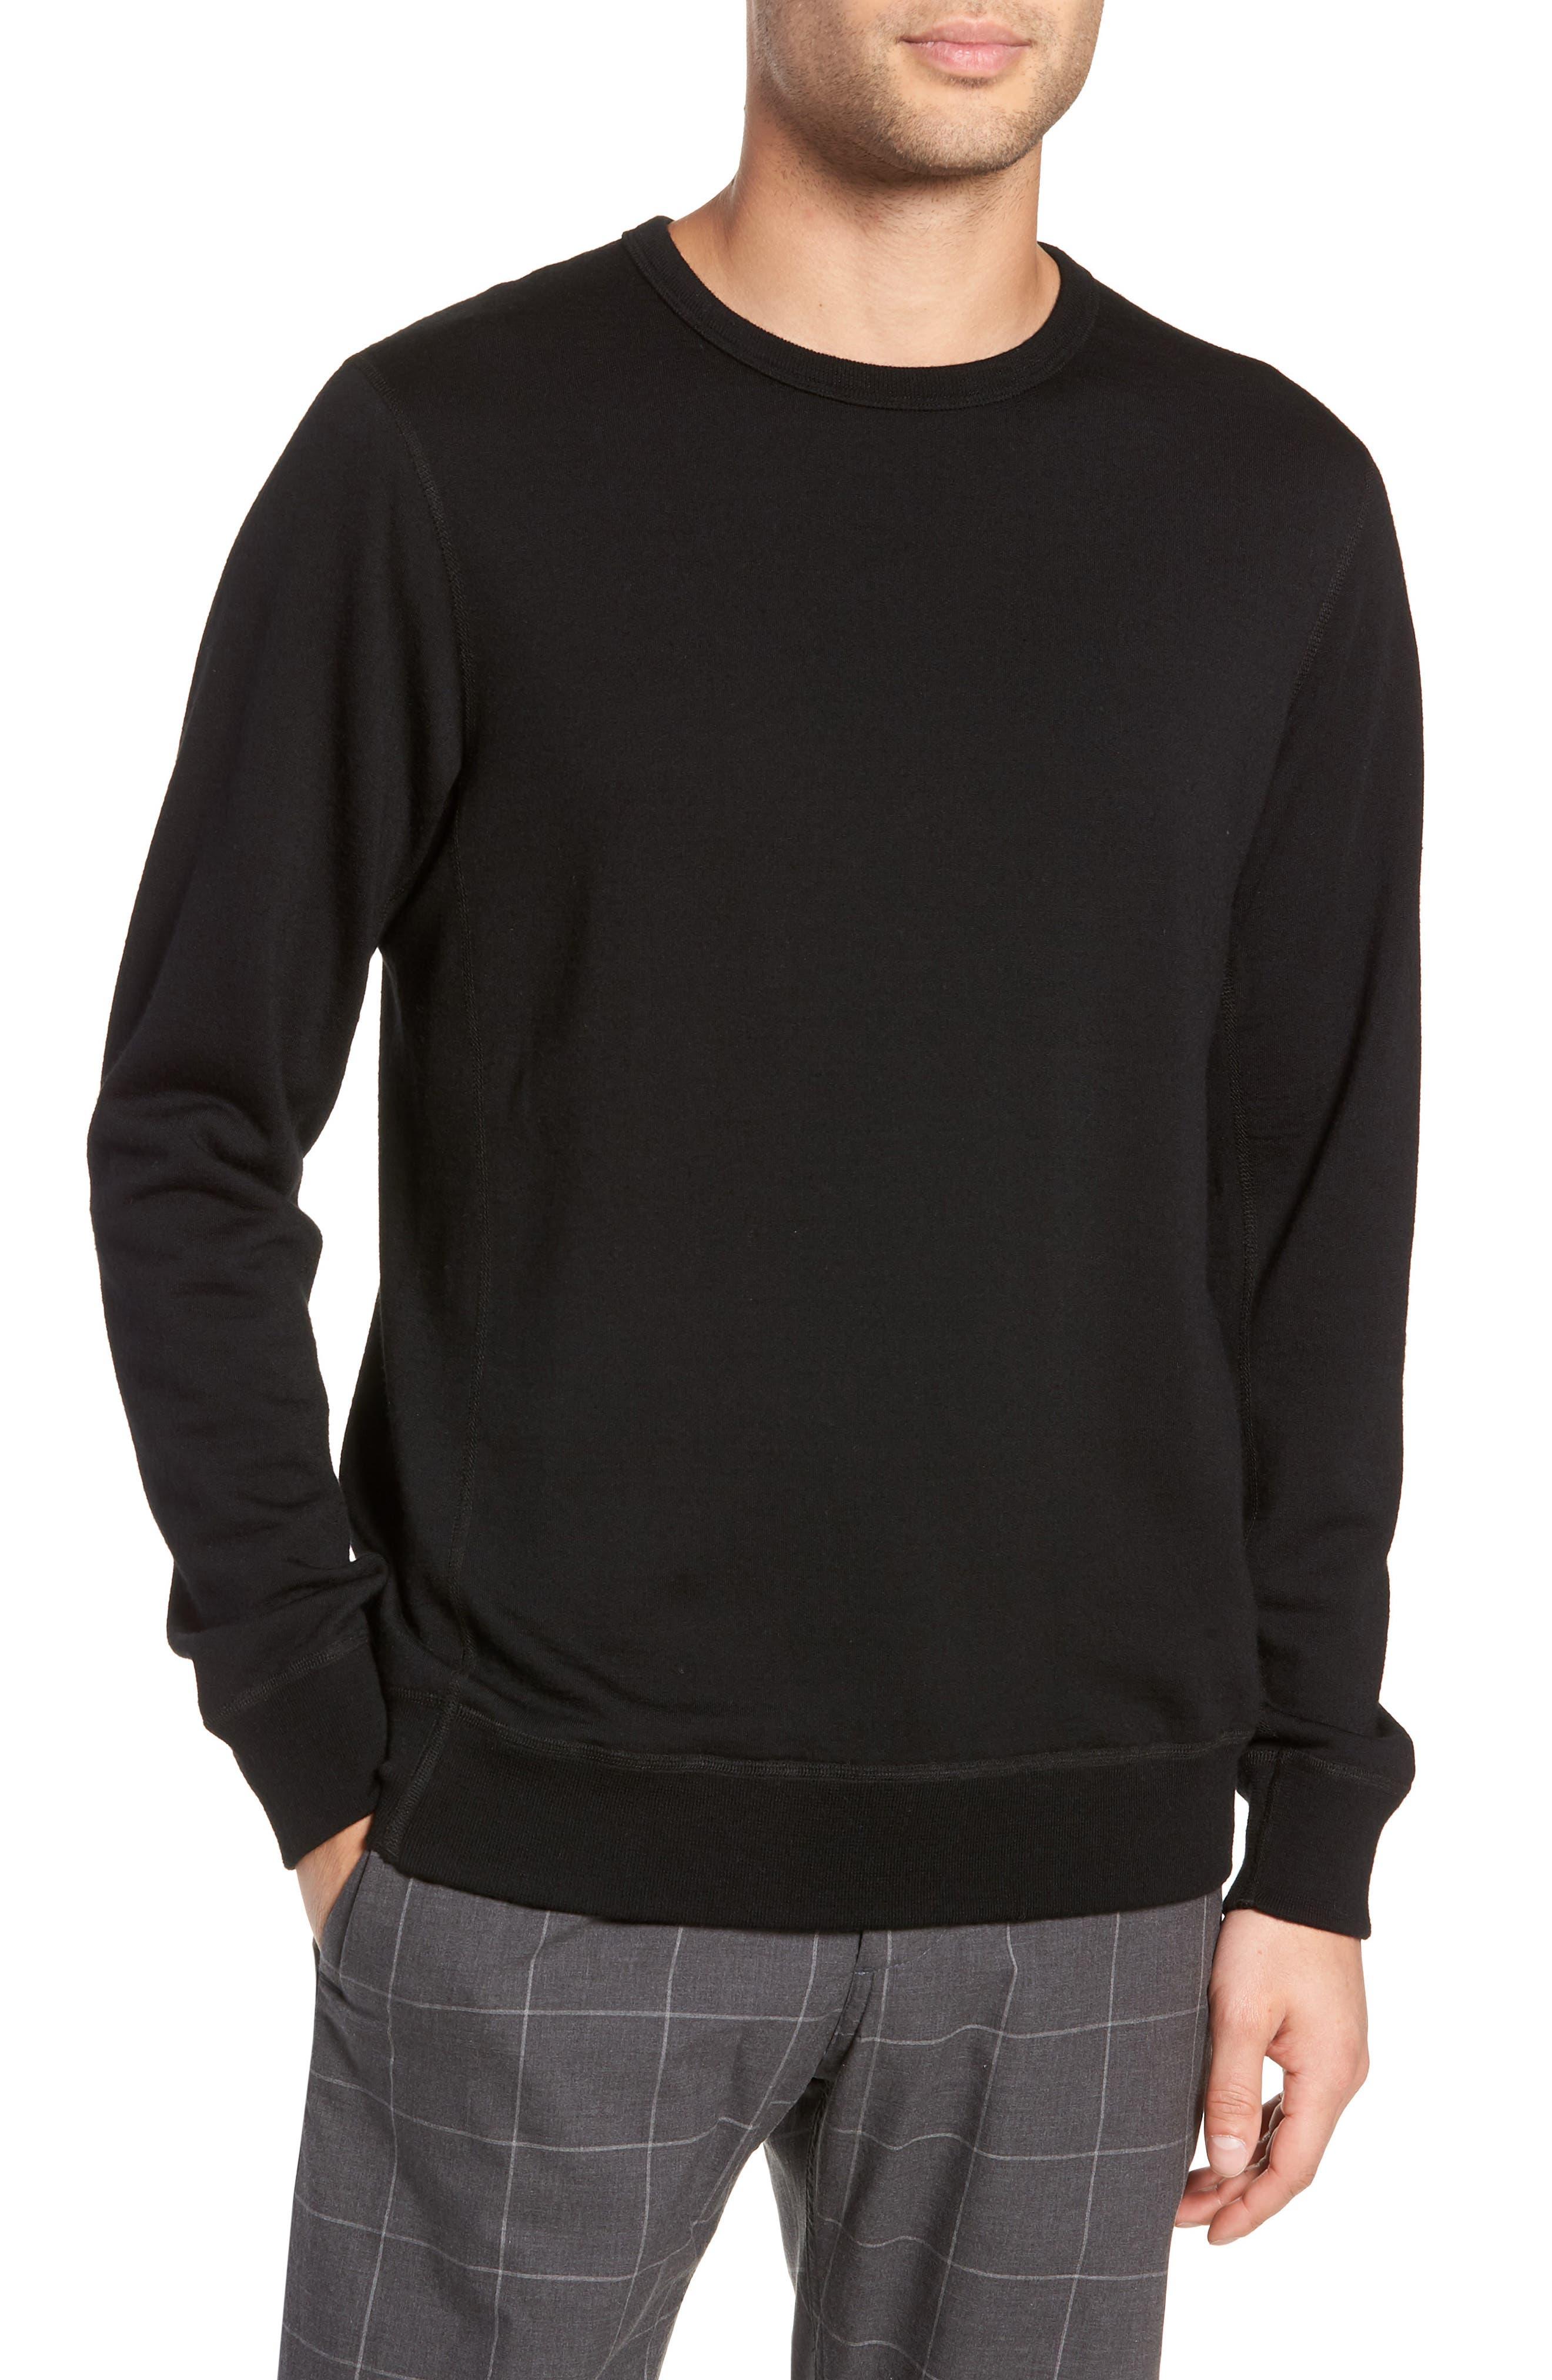 Swedish Merino Wool T-Shirt,                             Main thumbnail 1, color,                             BLACK